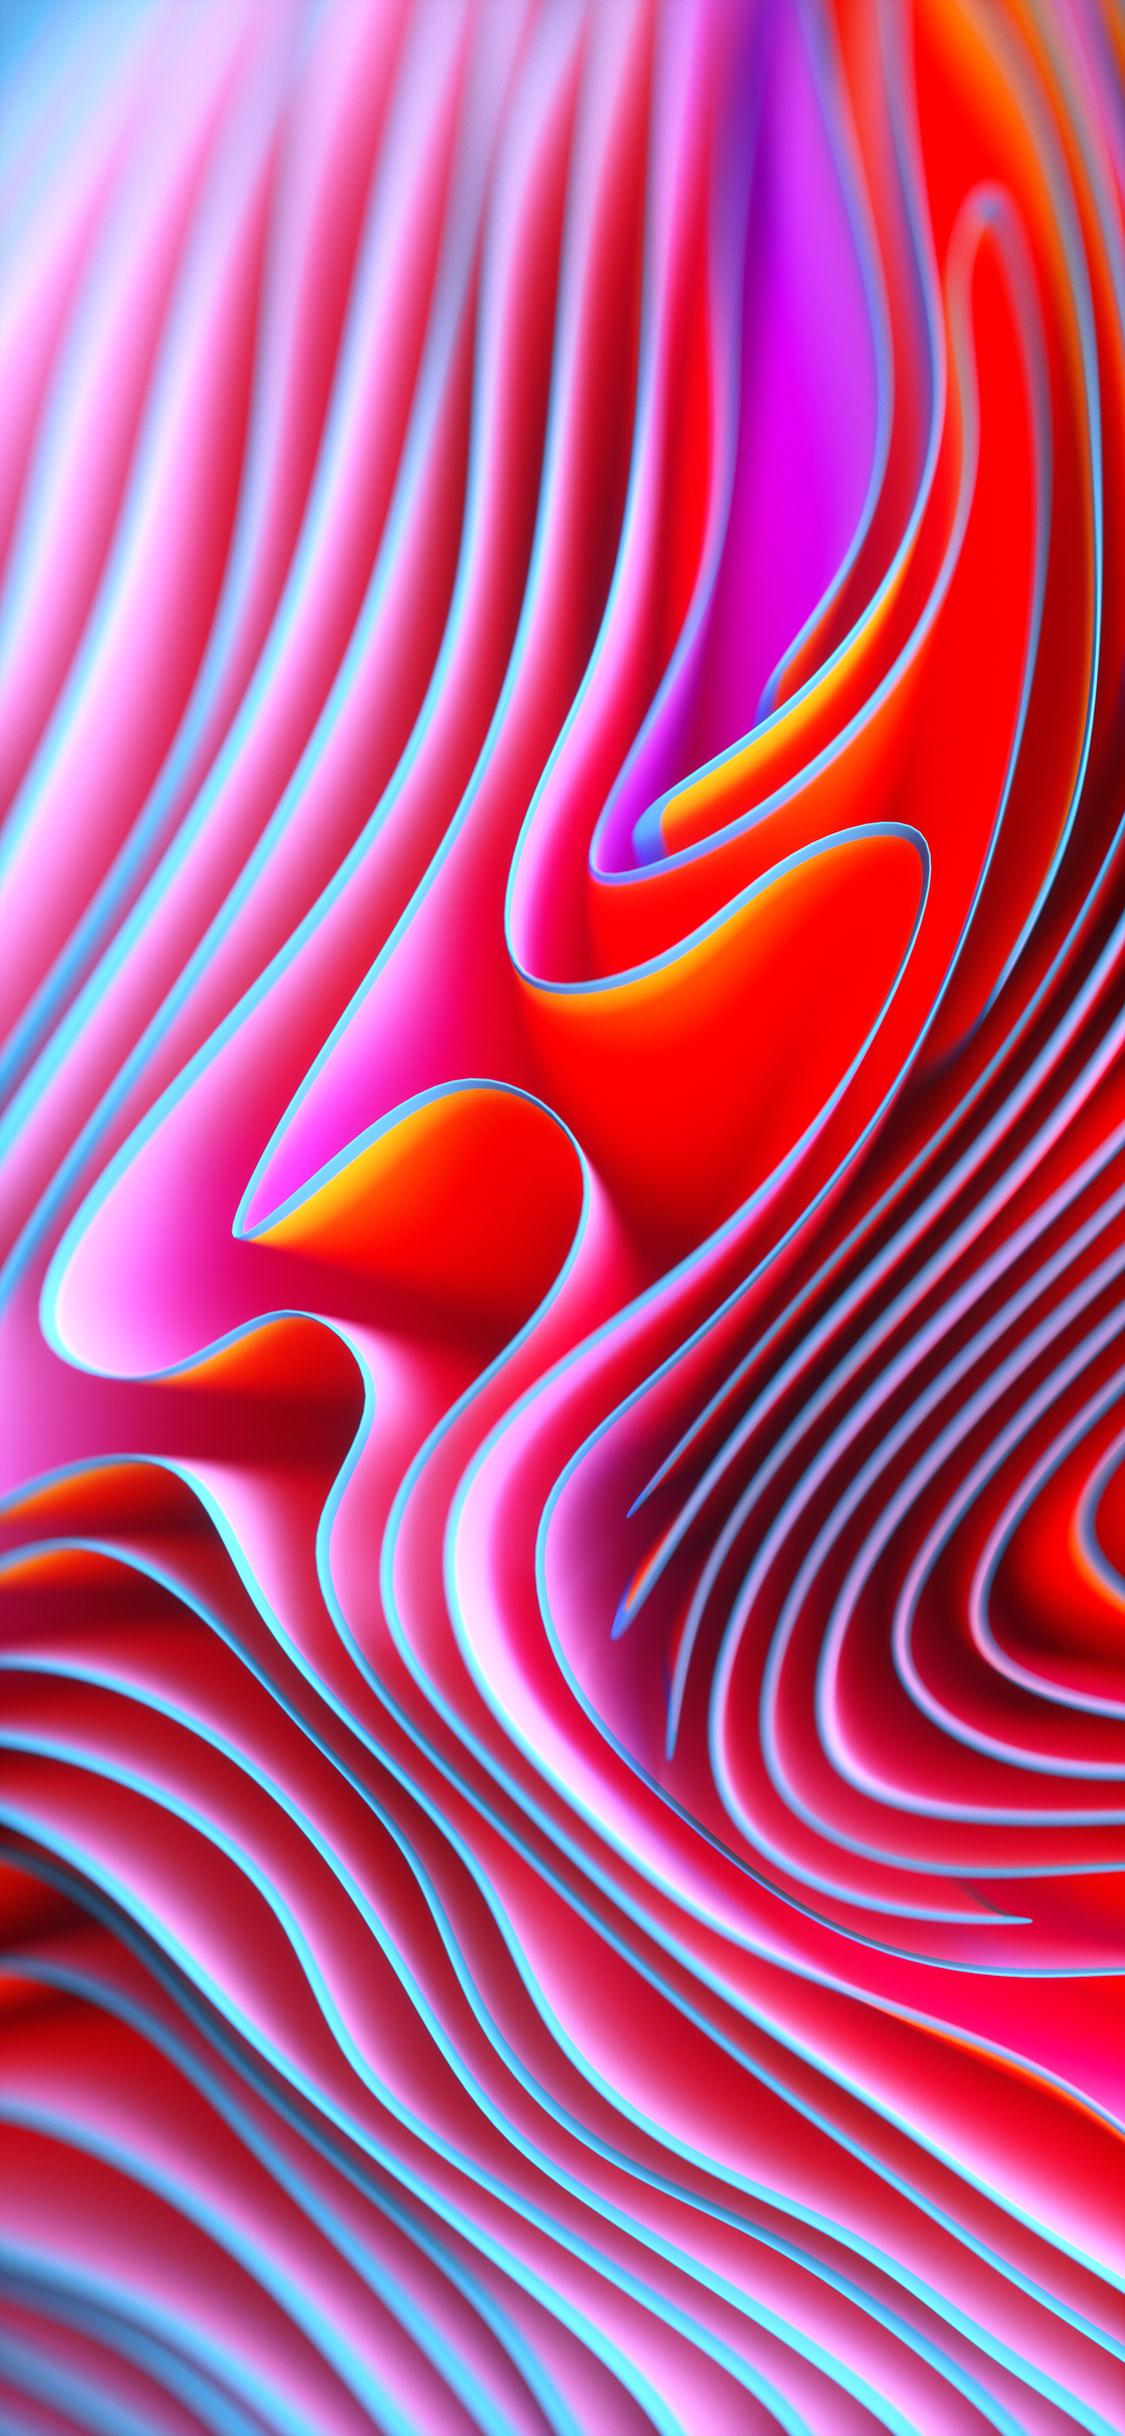 Twirl_00_00_00-1